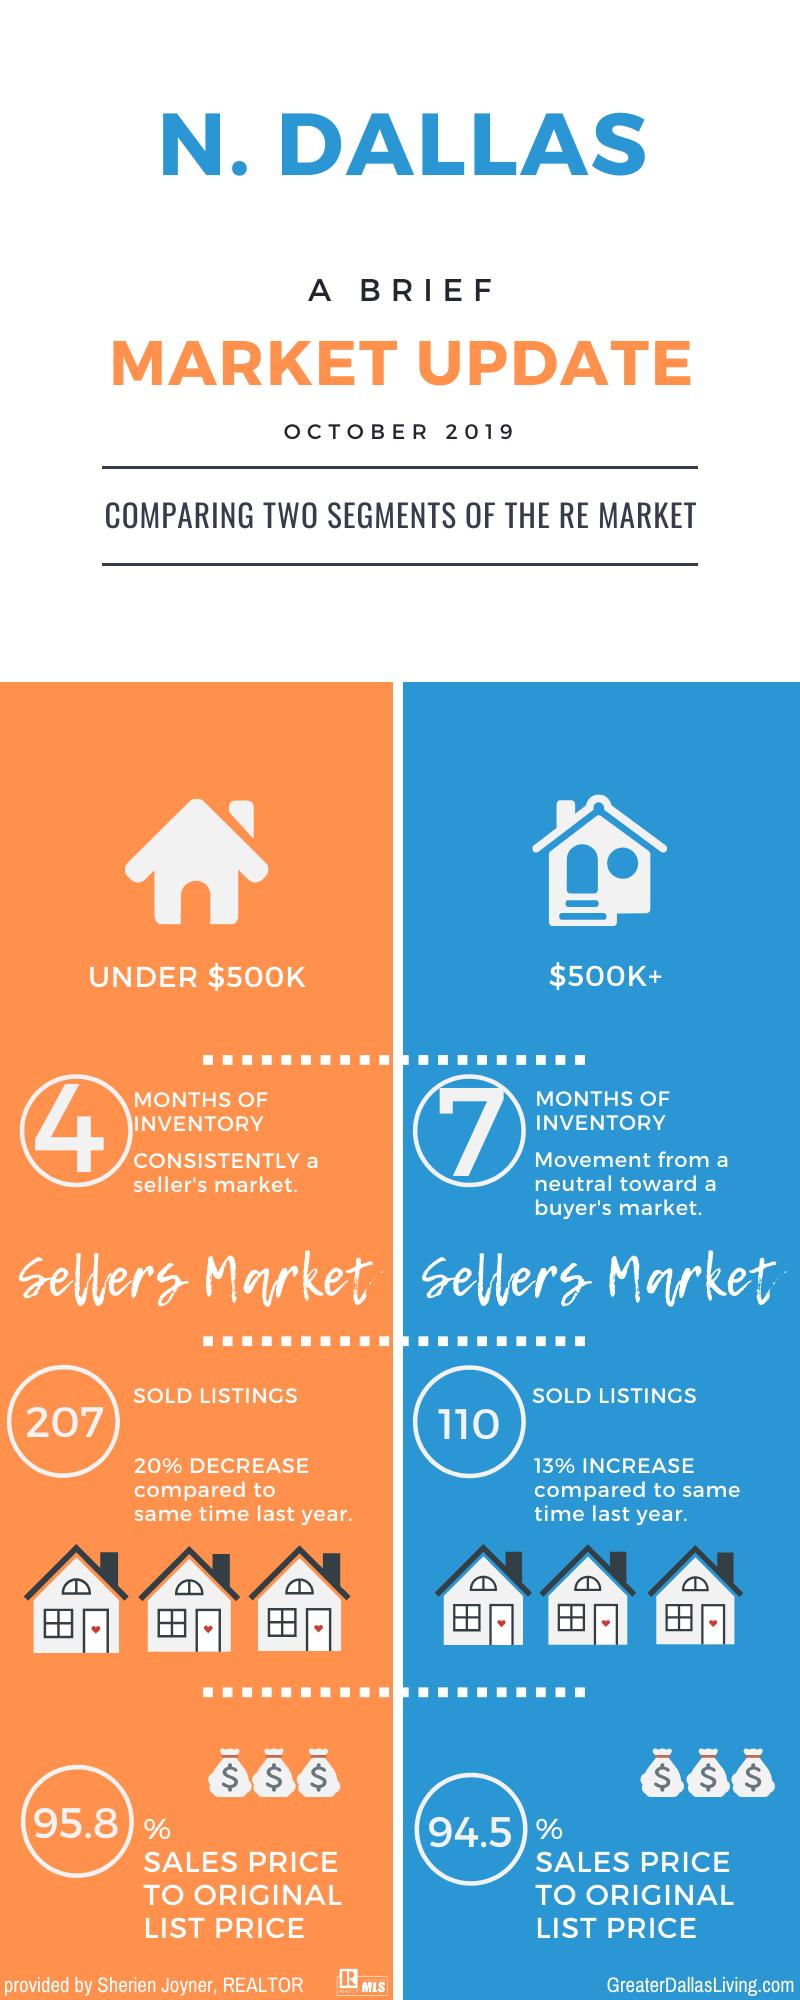 Dallas Market Update October 2019